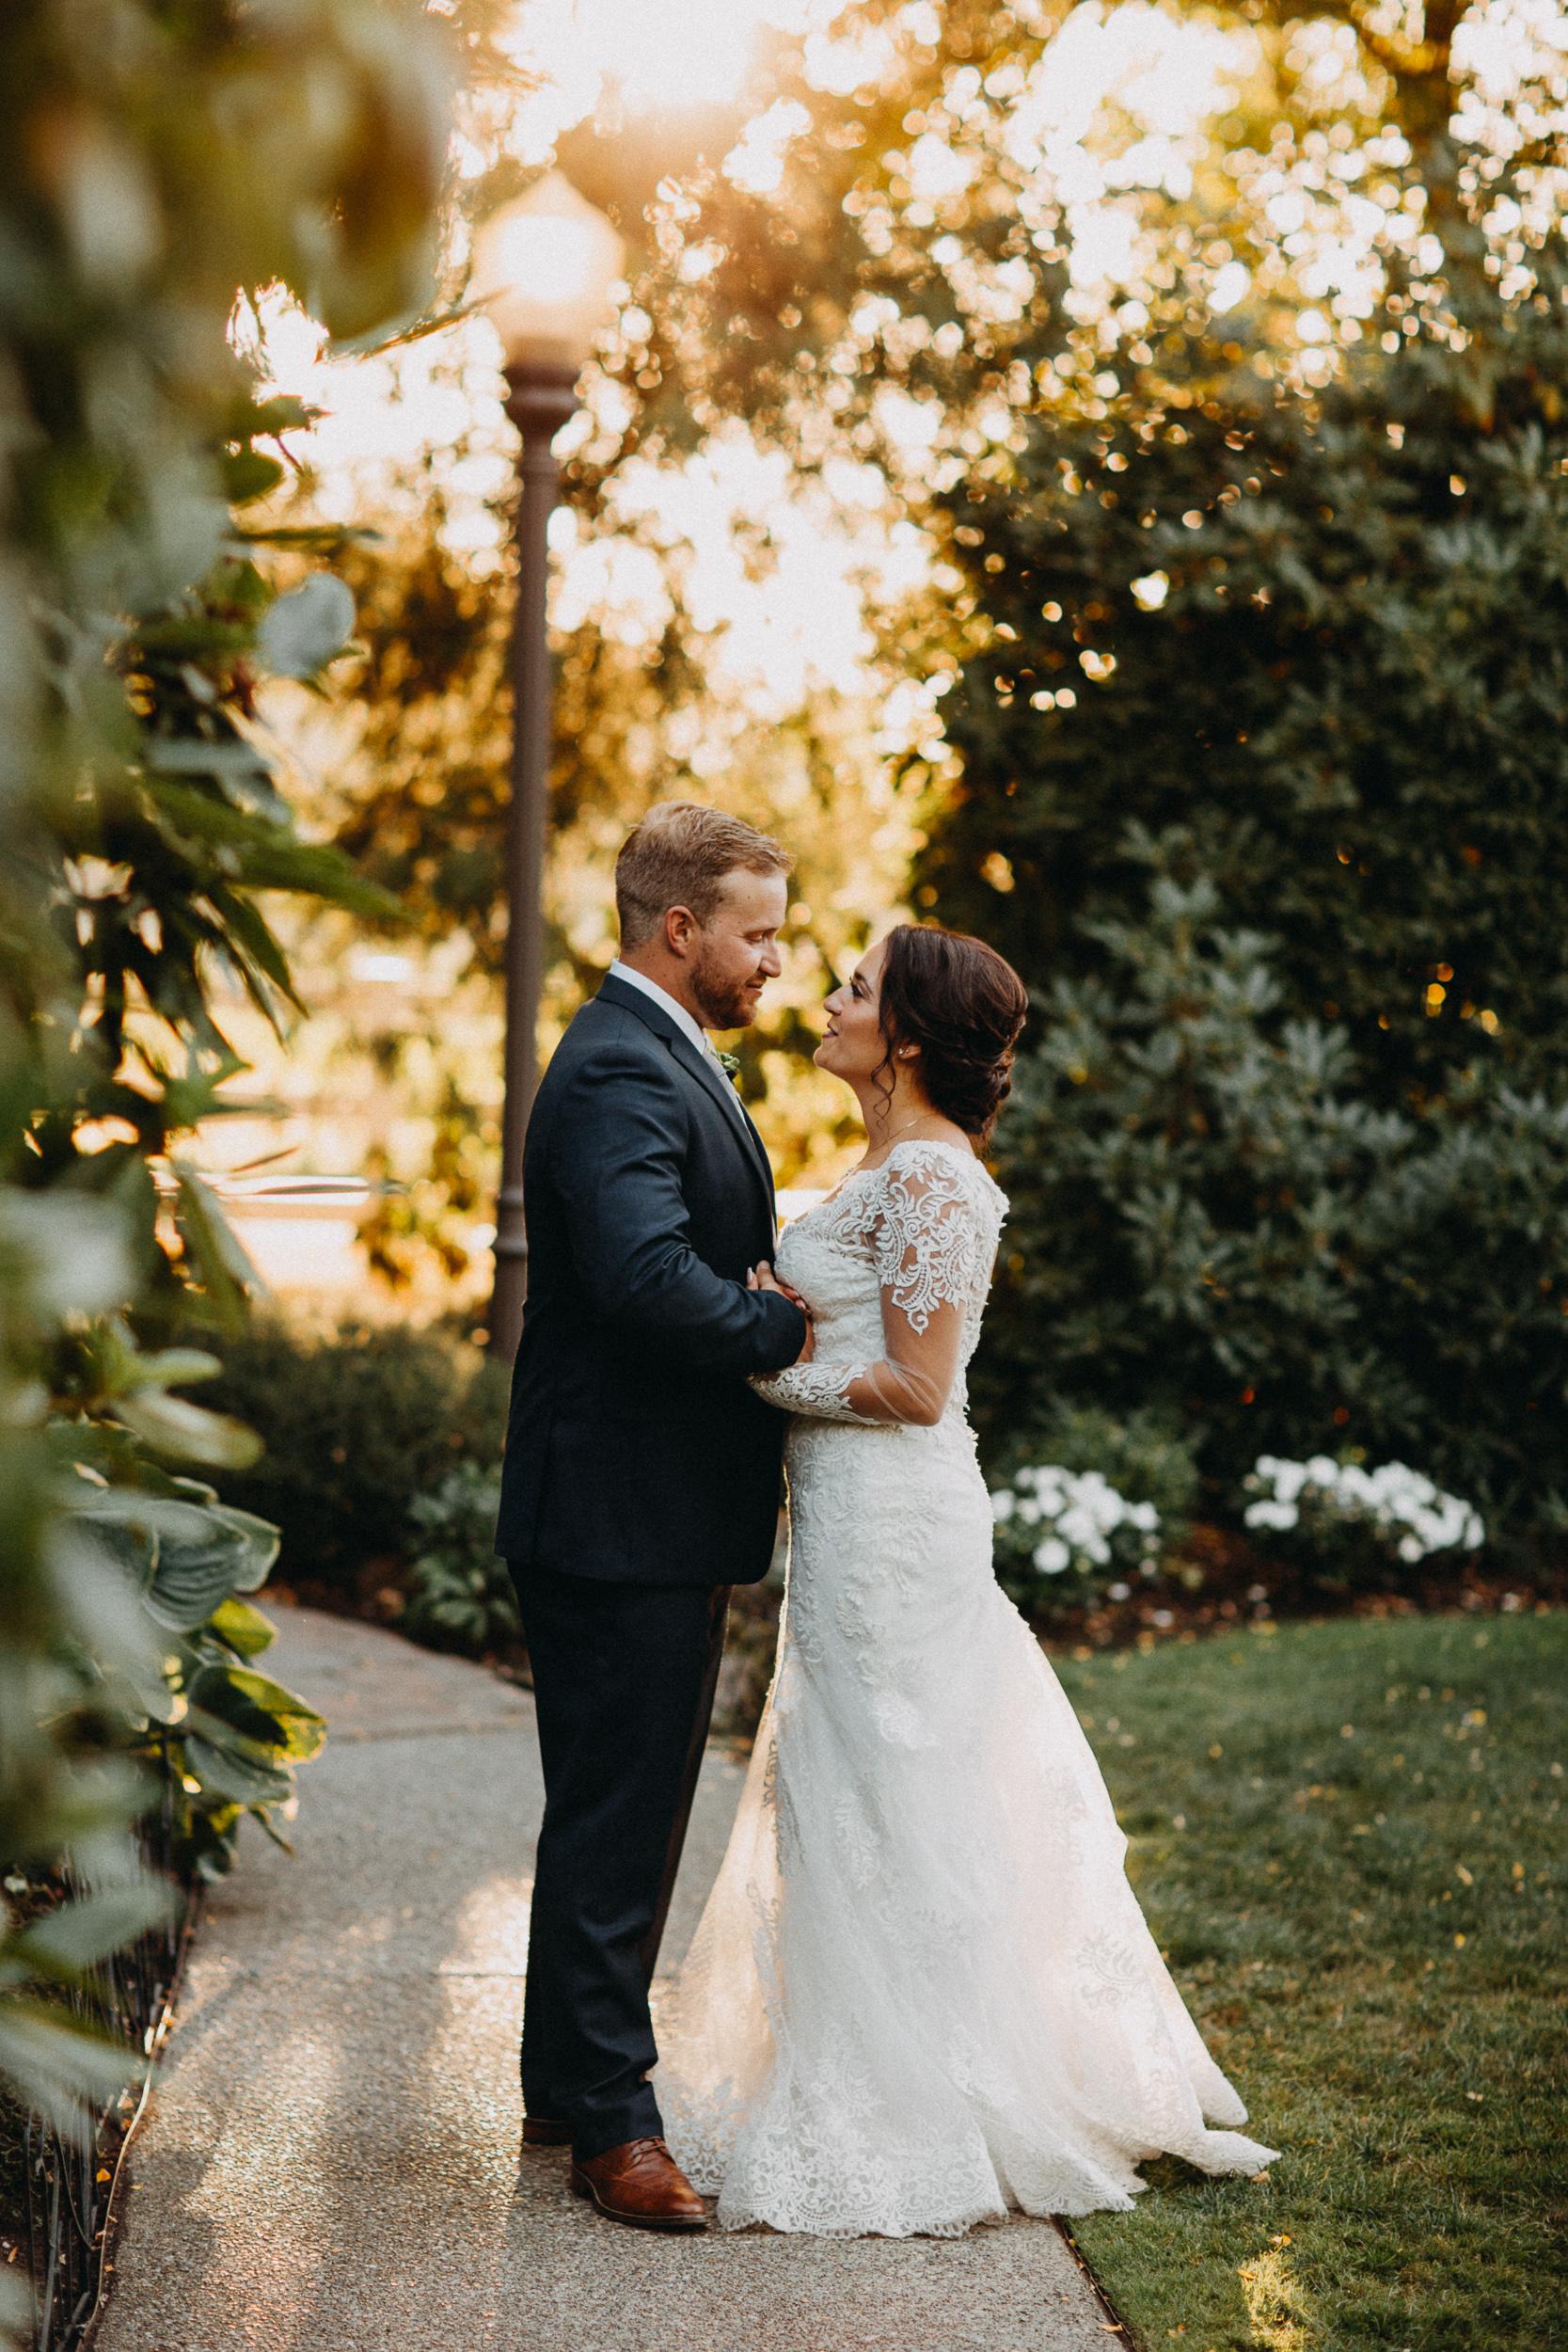 20170820 Savanna & Vince Wedding 324.jpg